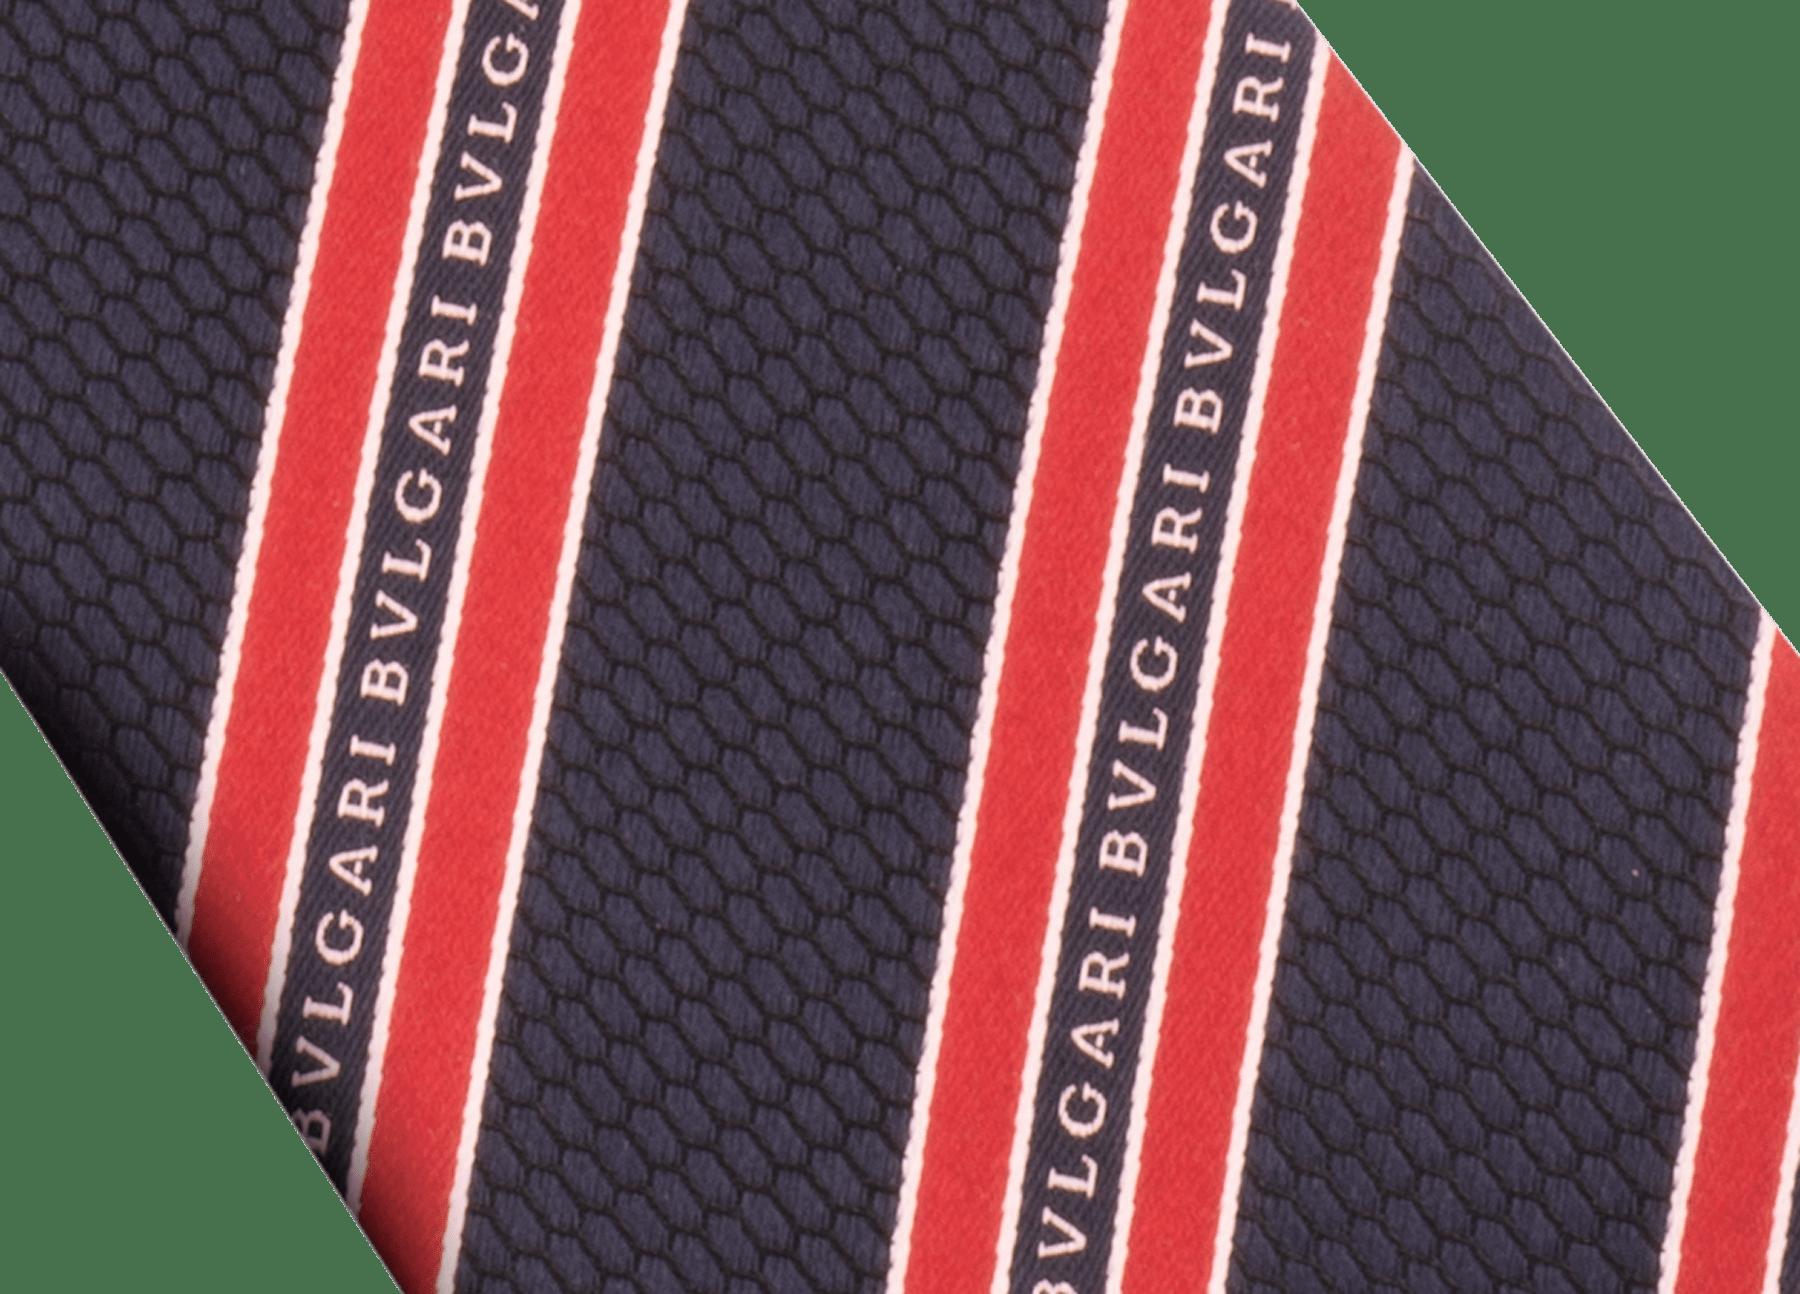 RegiScales Logo패턴의 세븐-폴드 타이. 카민 재스퍼 컬러의 고급 자카드 실크 소재 LogoRegiScales image 2